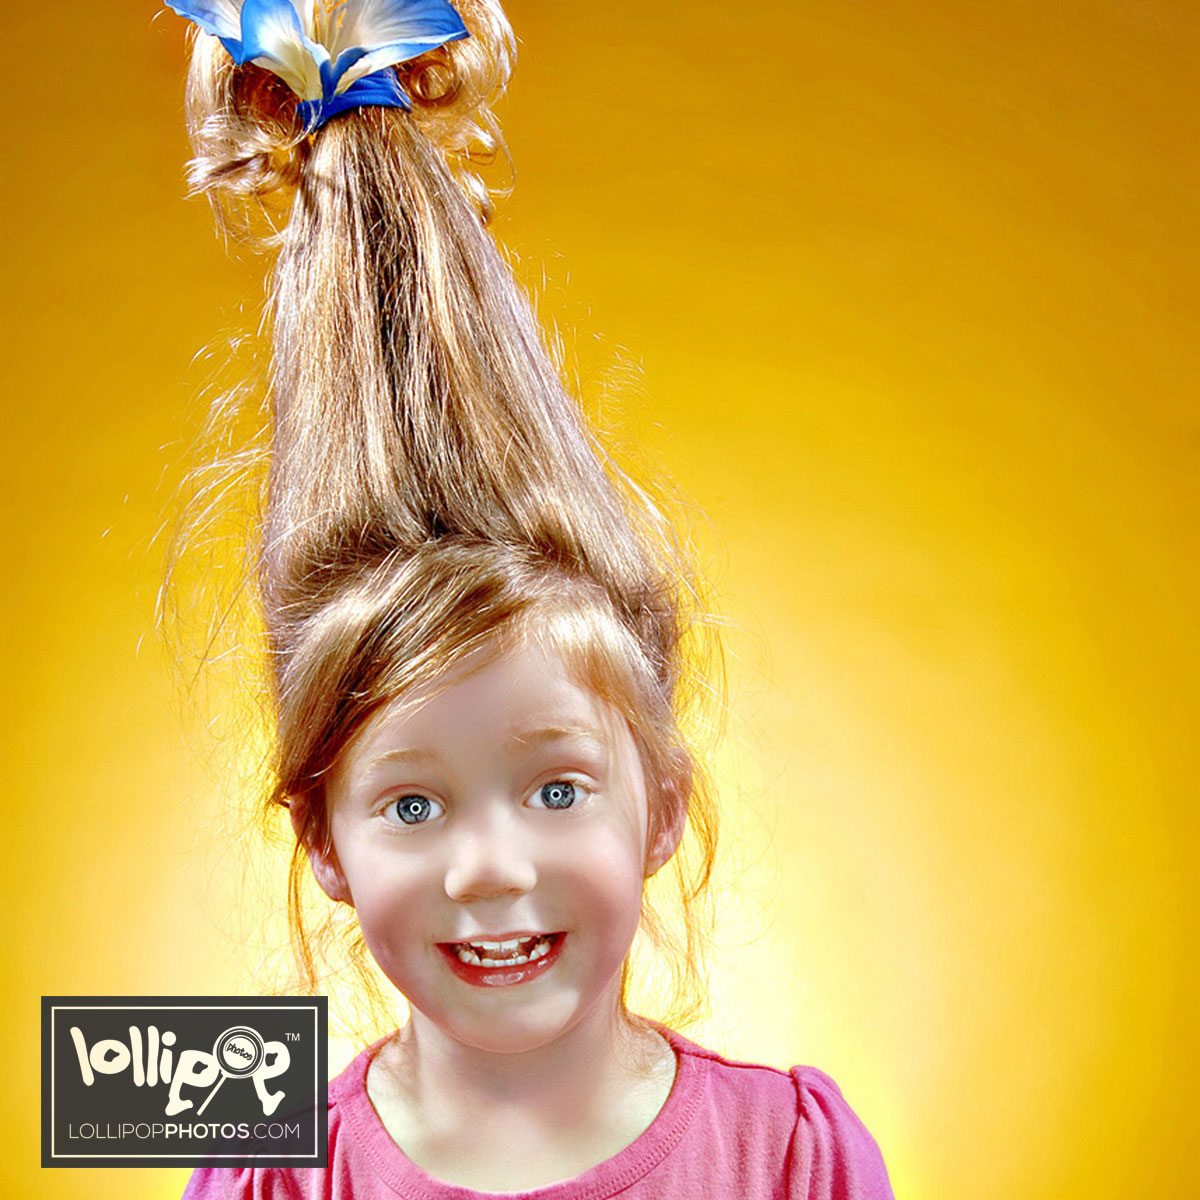 msdig-nora-canfield-lollipop-photos-328.jpg